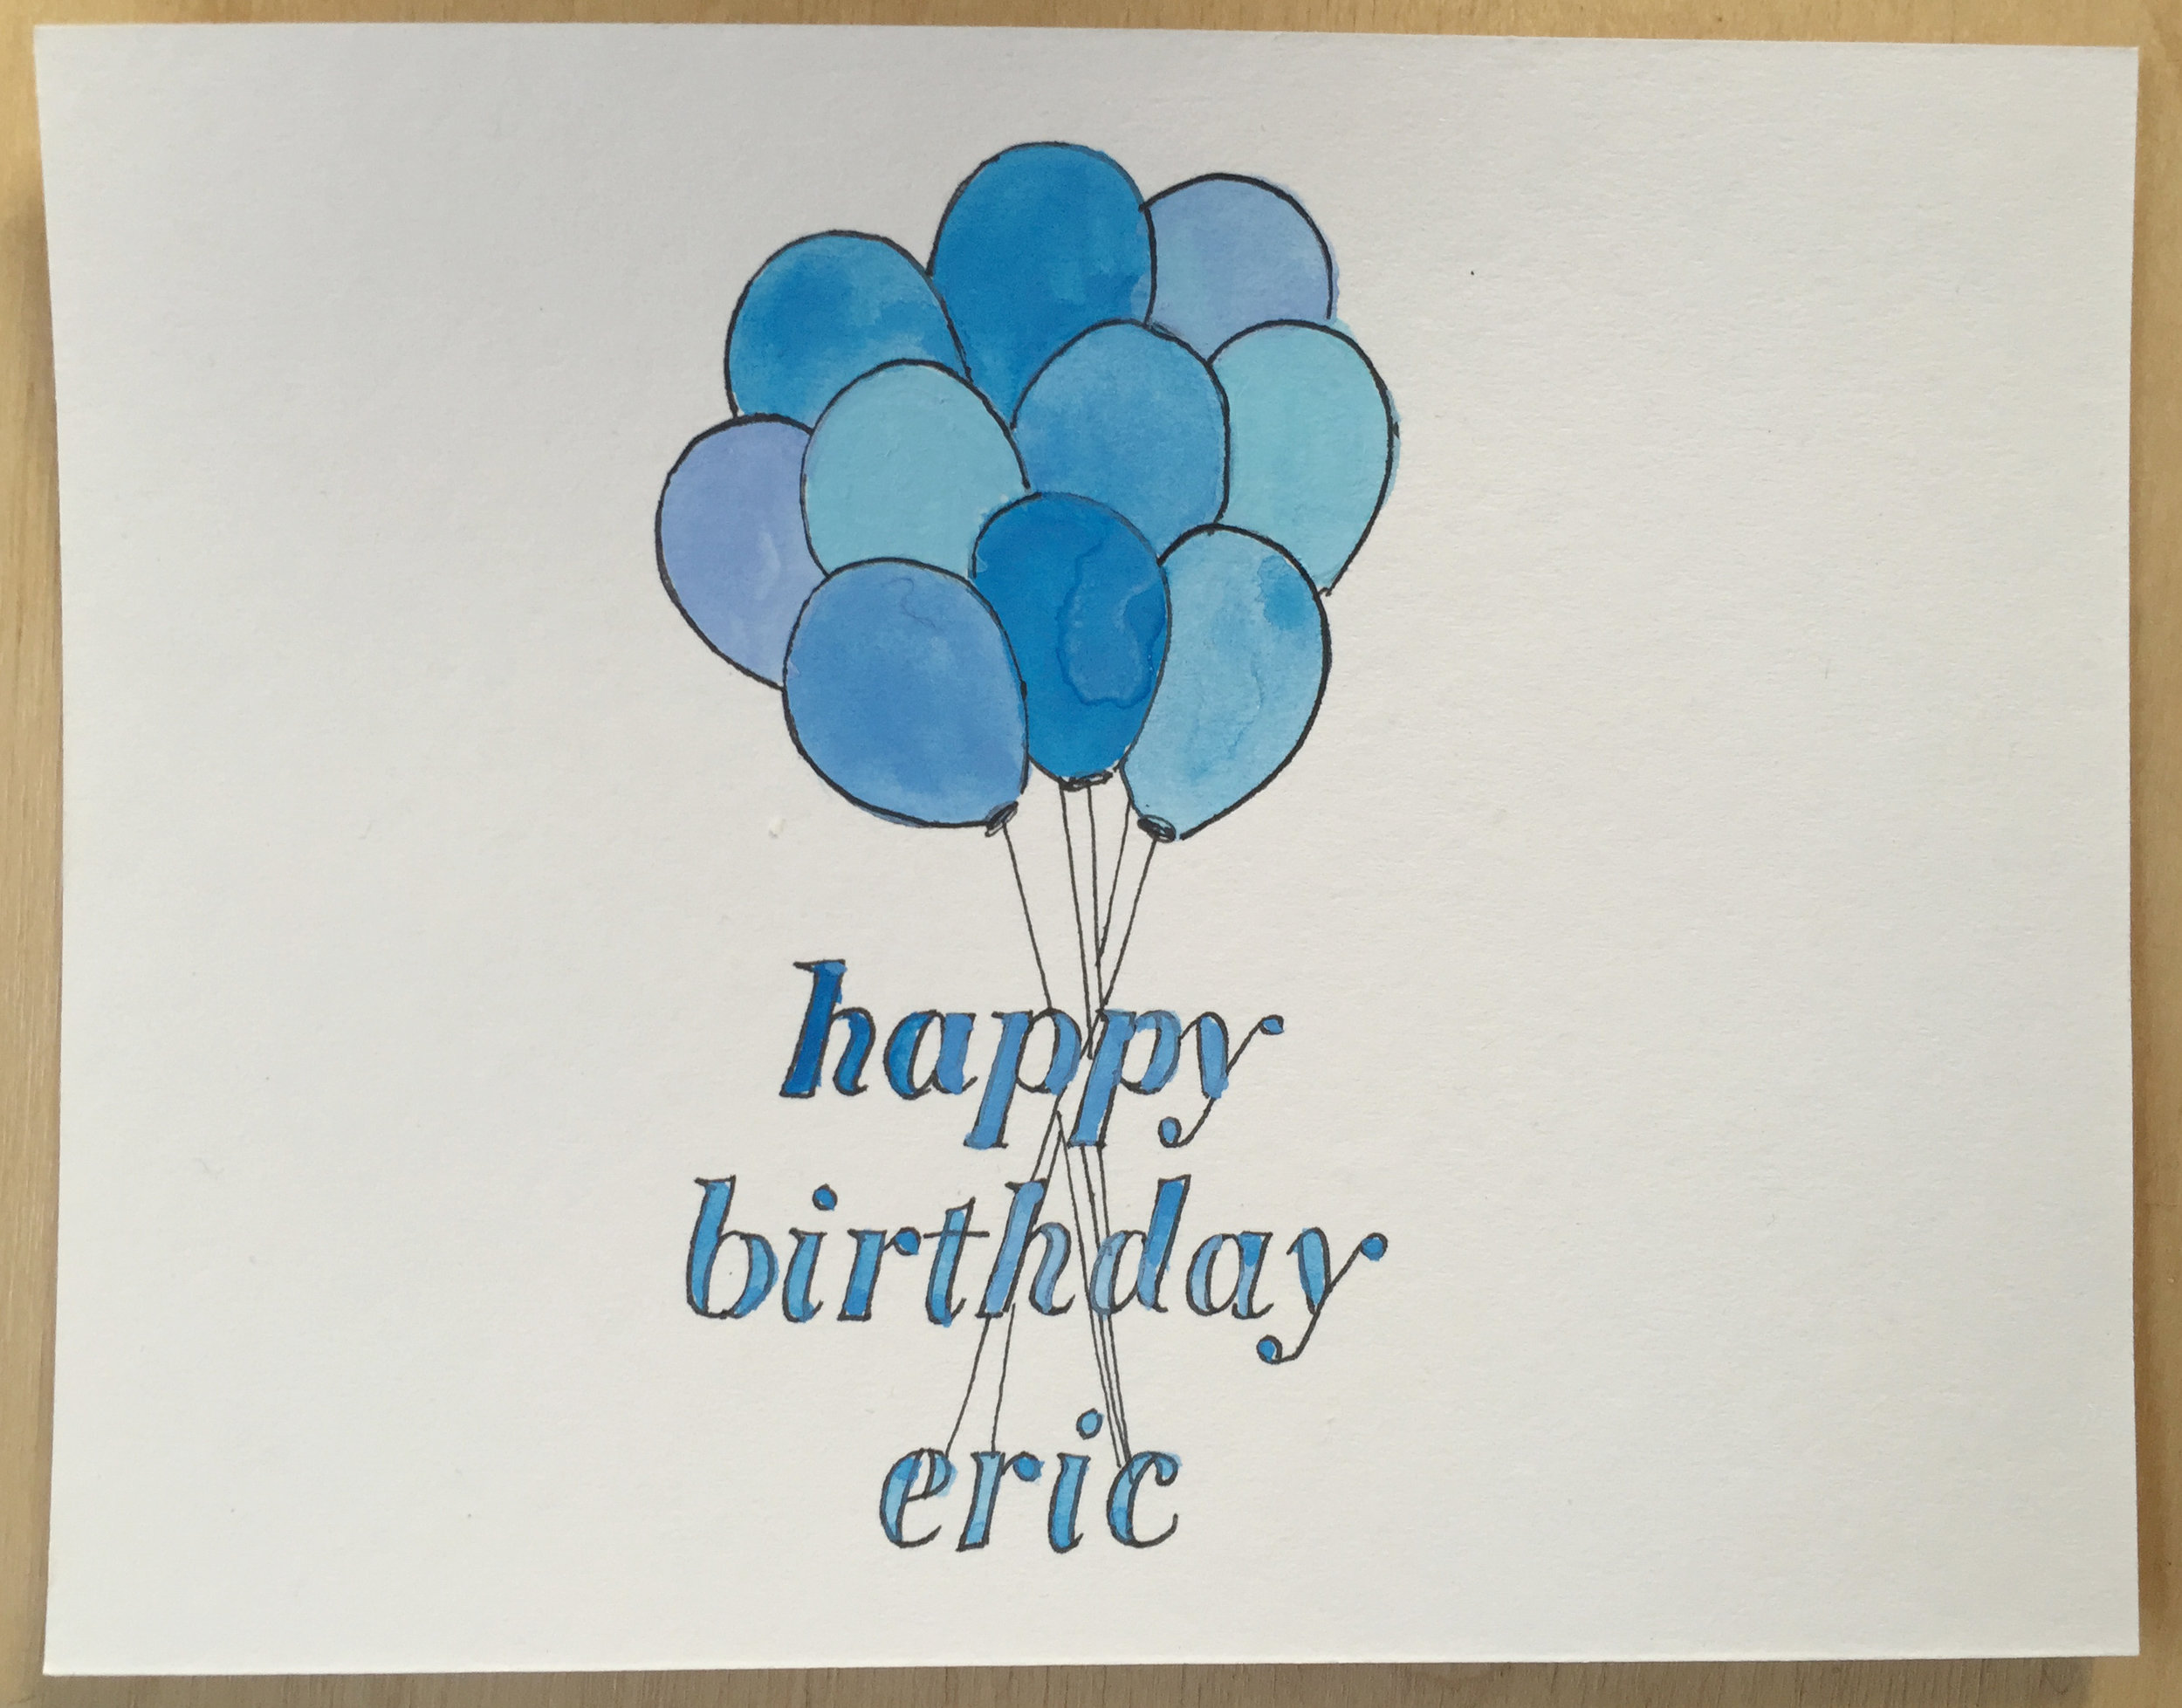 ericbdaycard.jpg